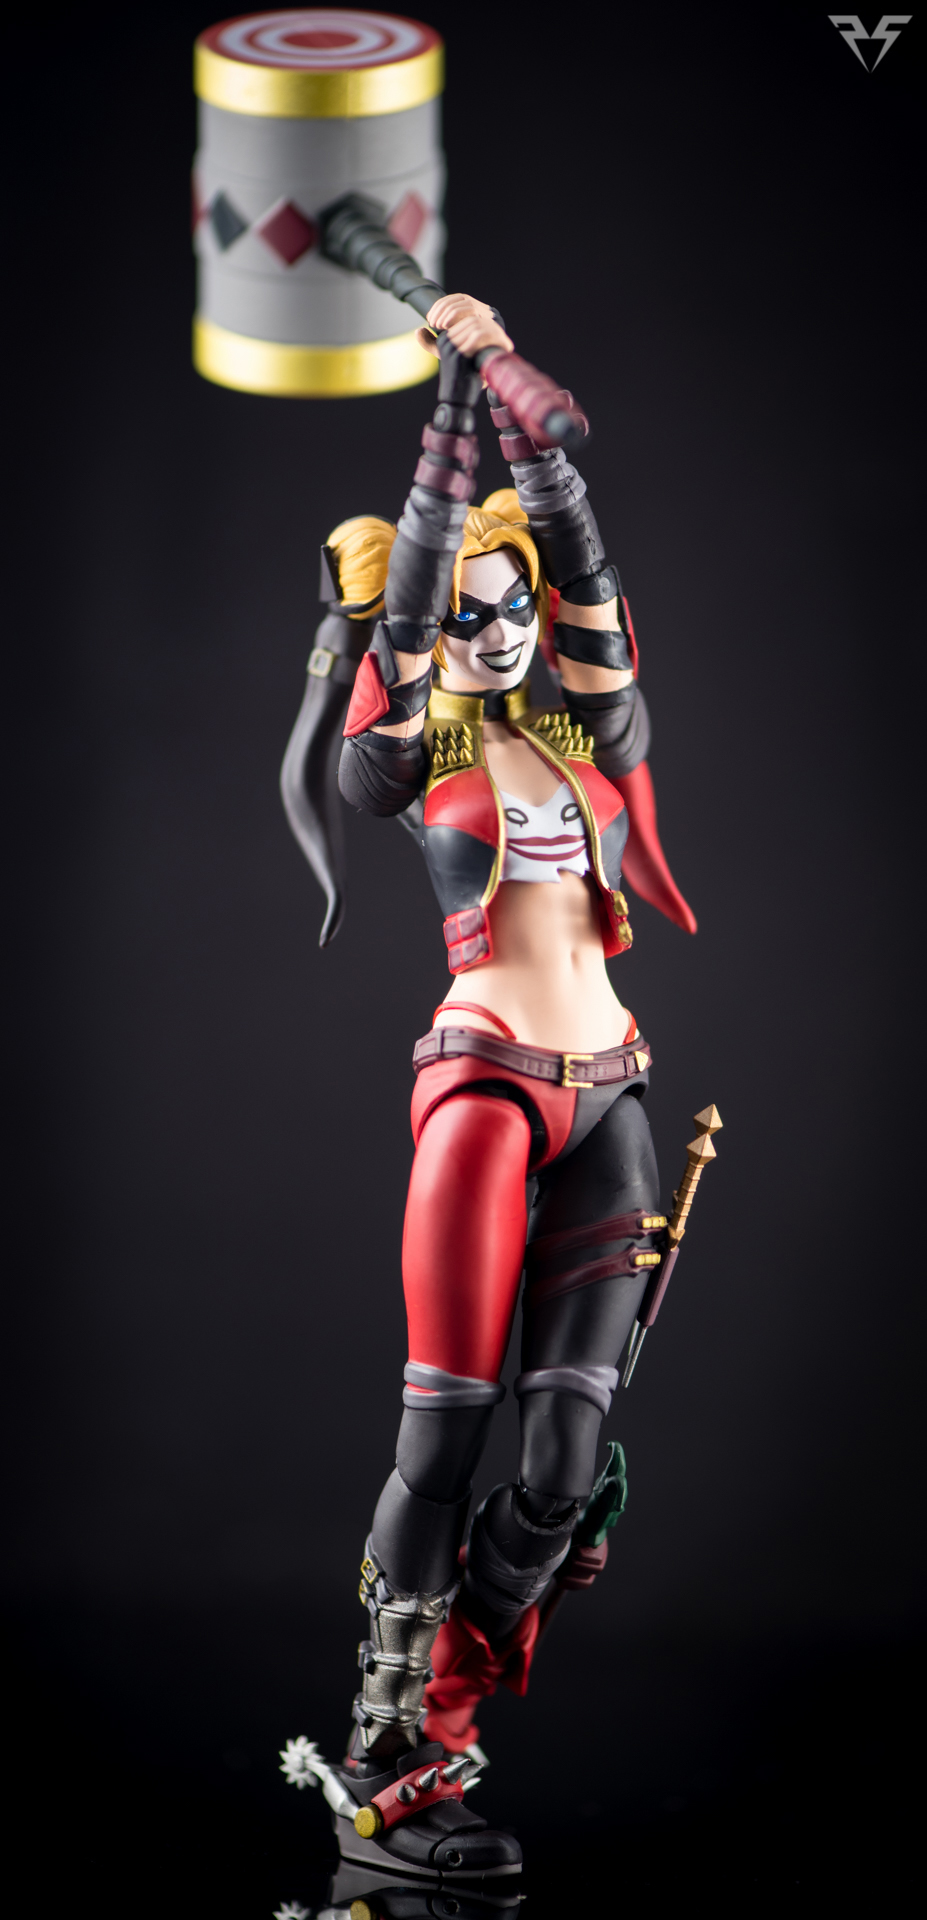 Figuarts Harley Quinn-16.jpg